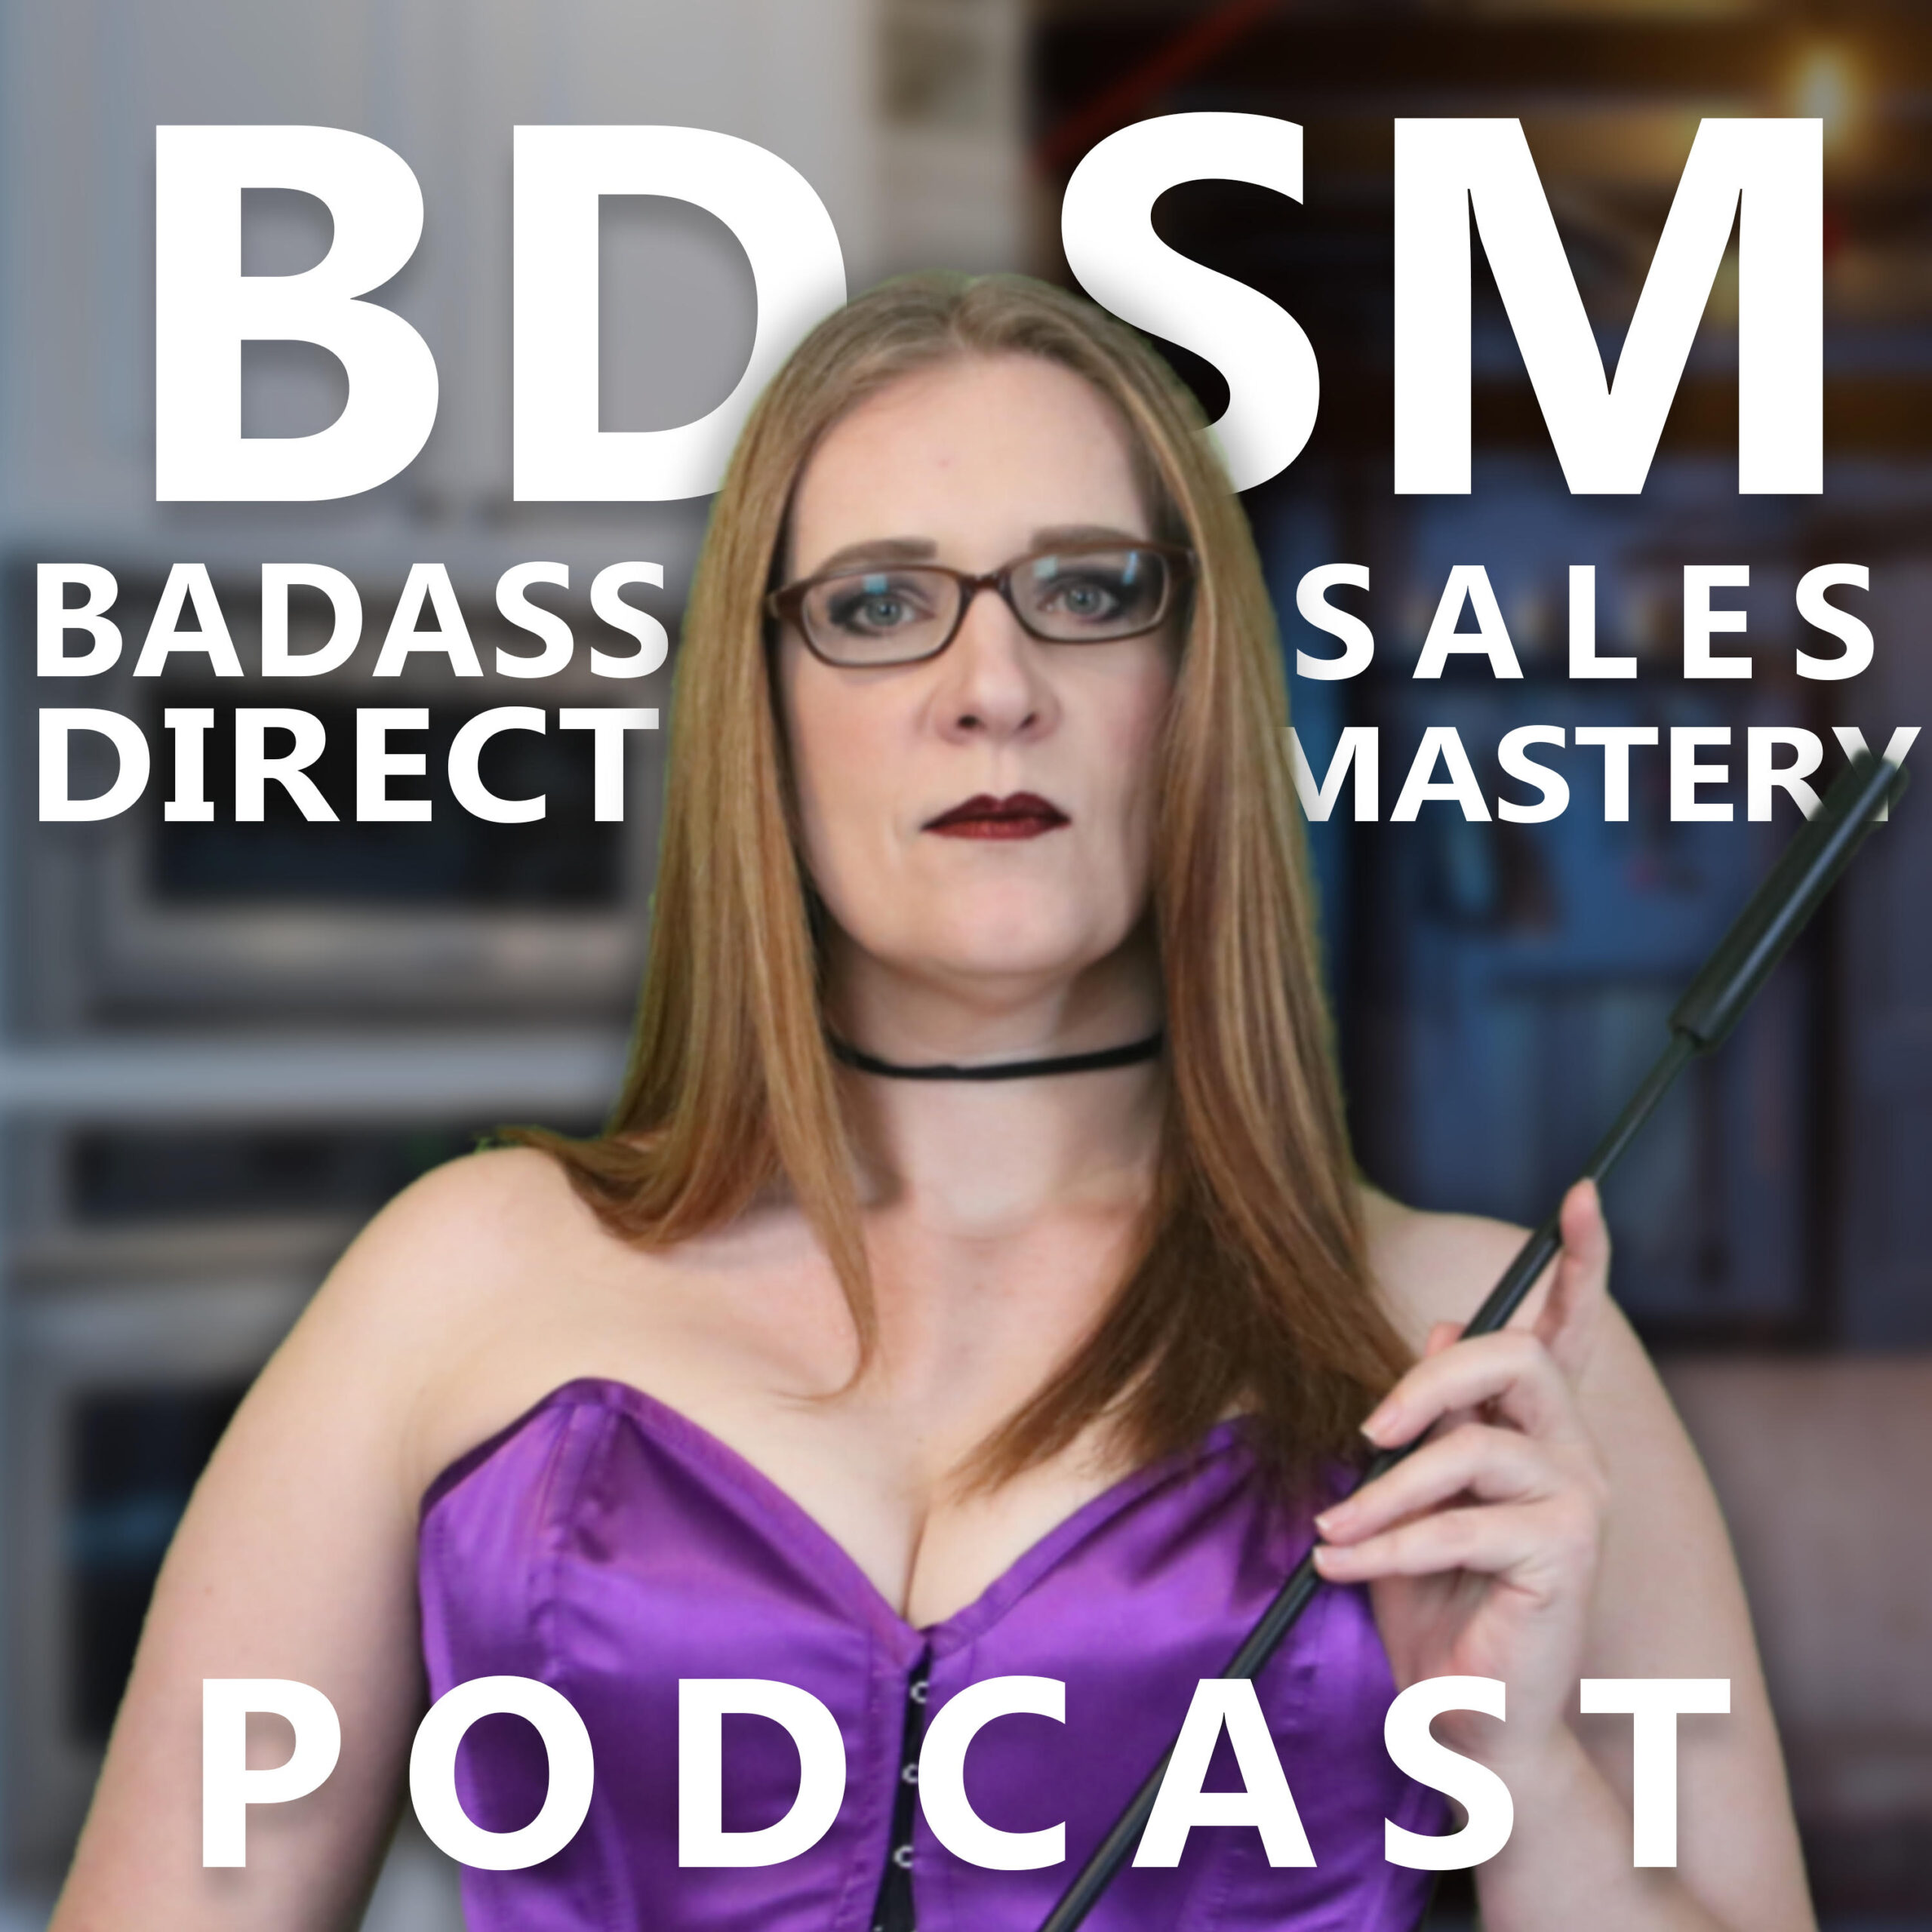 Badass Direct Sales Mastery Podcast